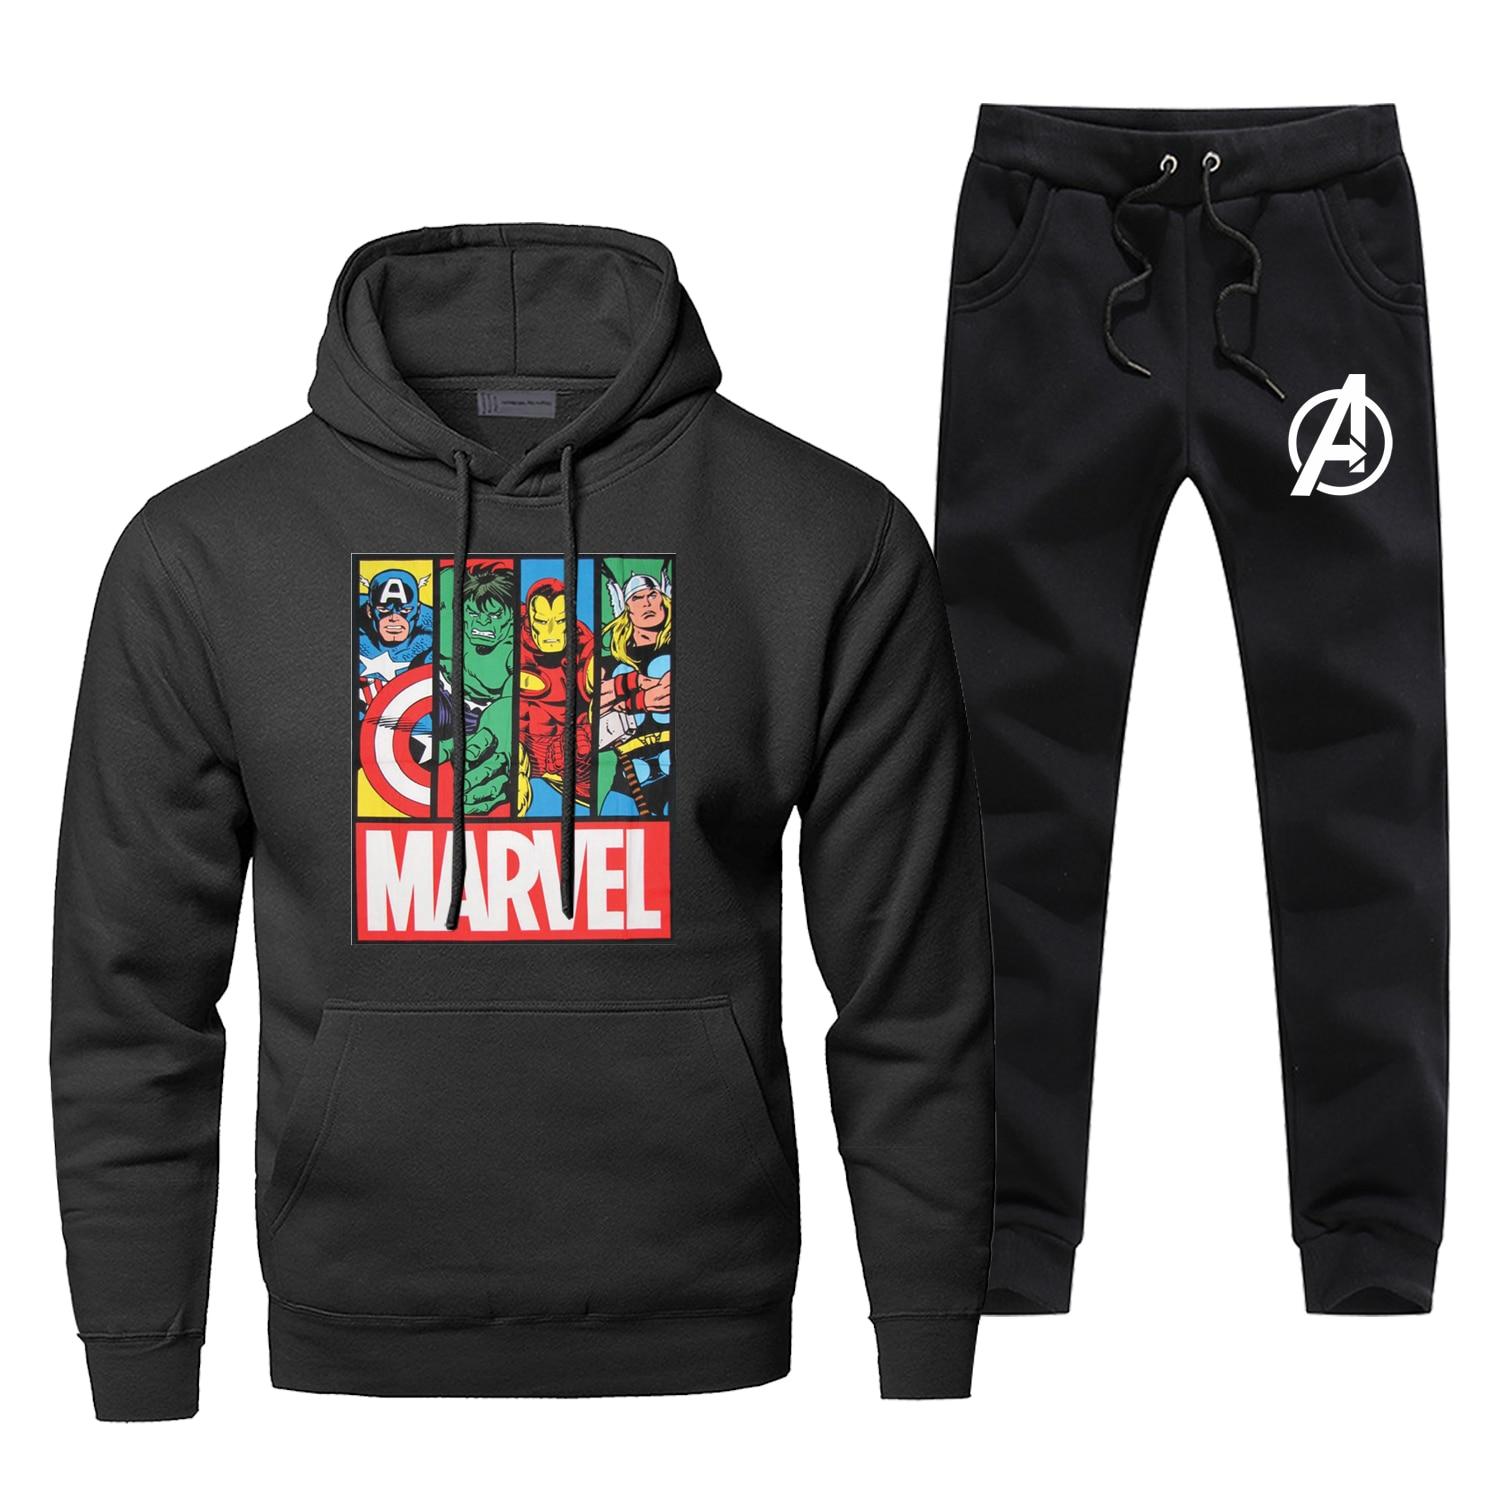 Marvel Avengers Mens Hoodies Sets Two Piece Pant Superhero Hoody Sweatshirt Sweatpants Streetwear Iron Man Thor Hulk Sweatshirts